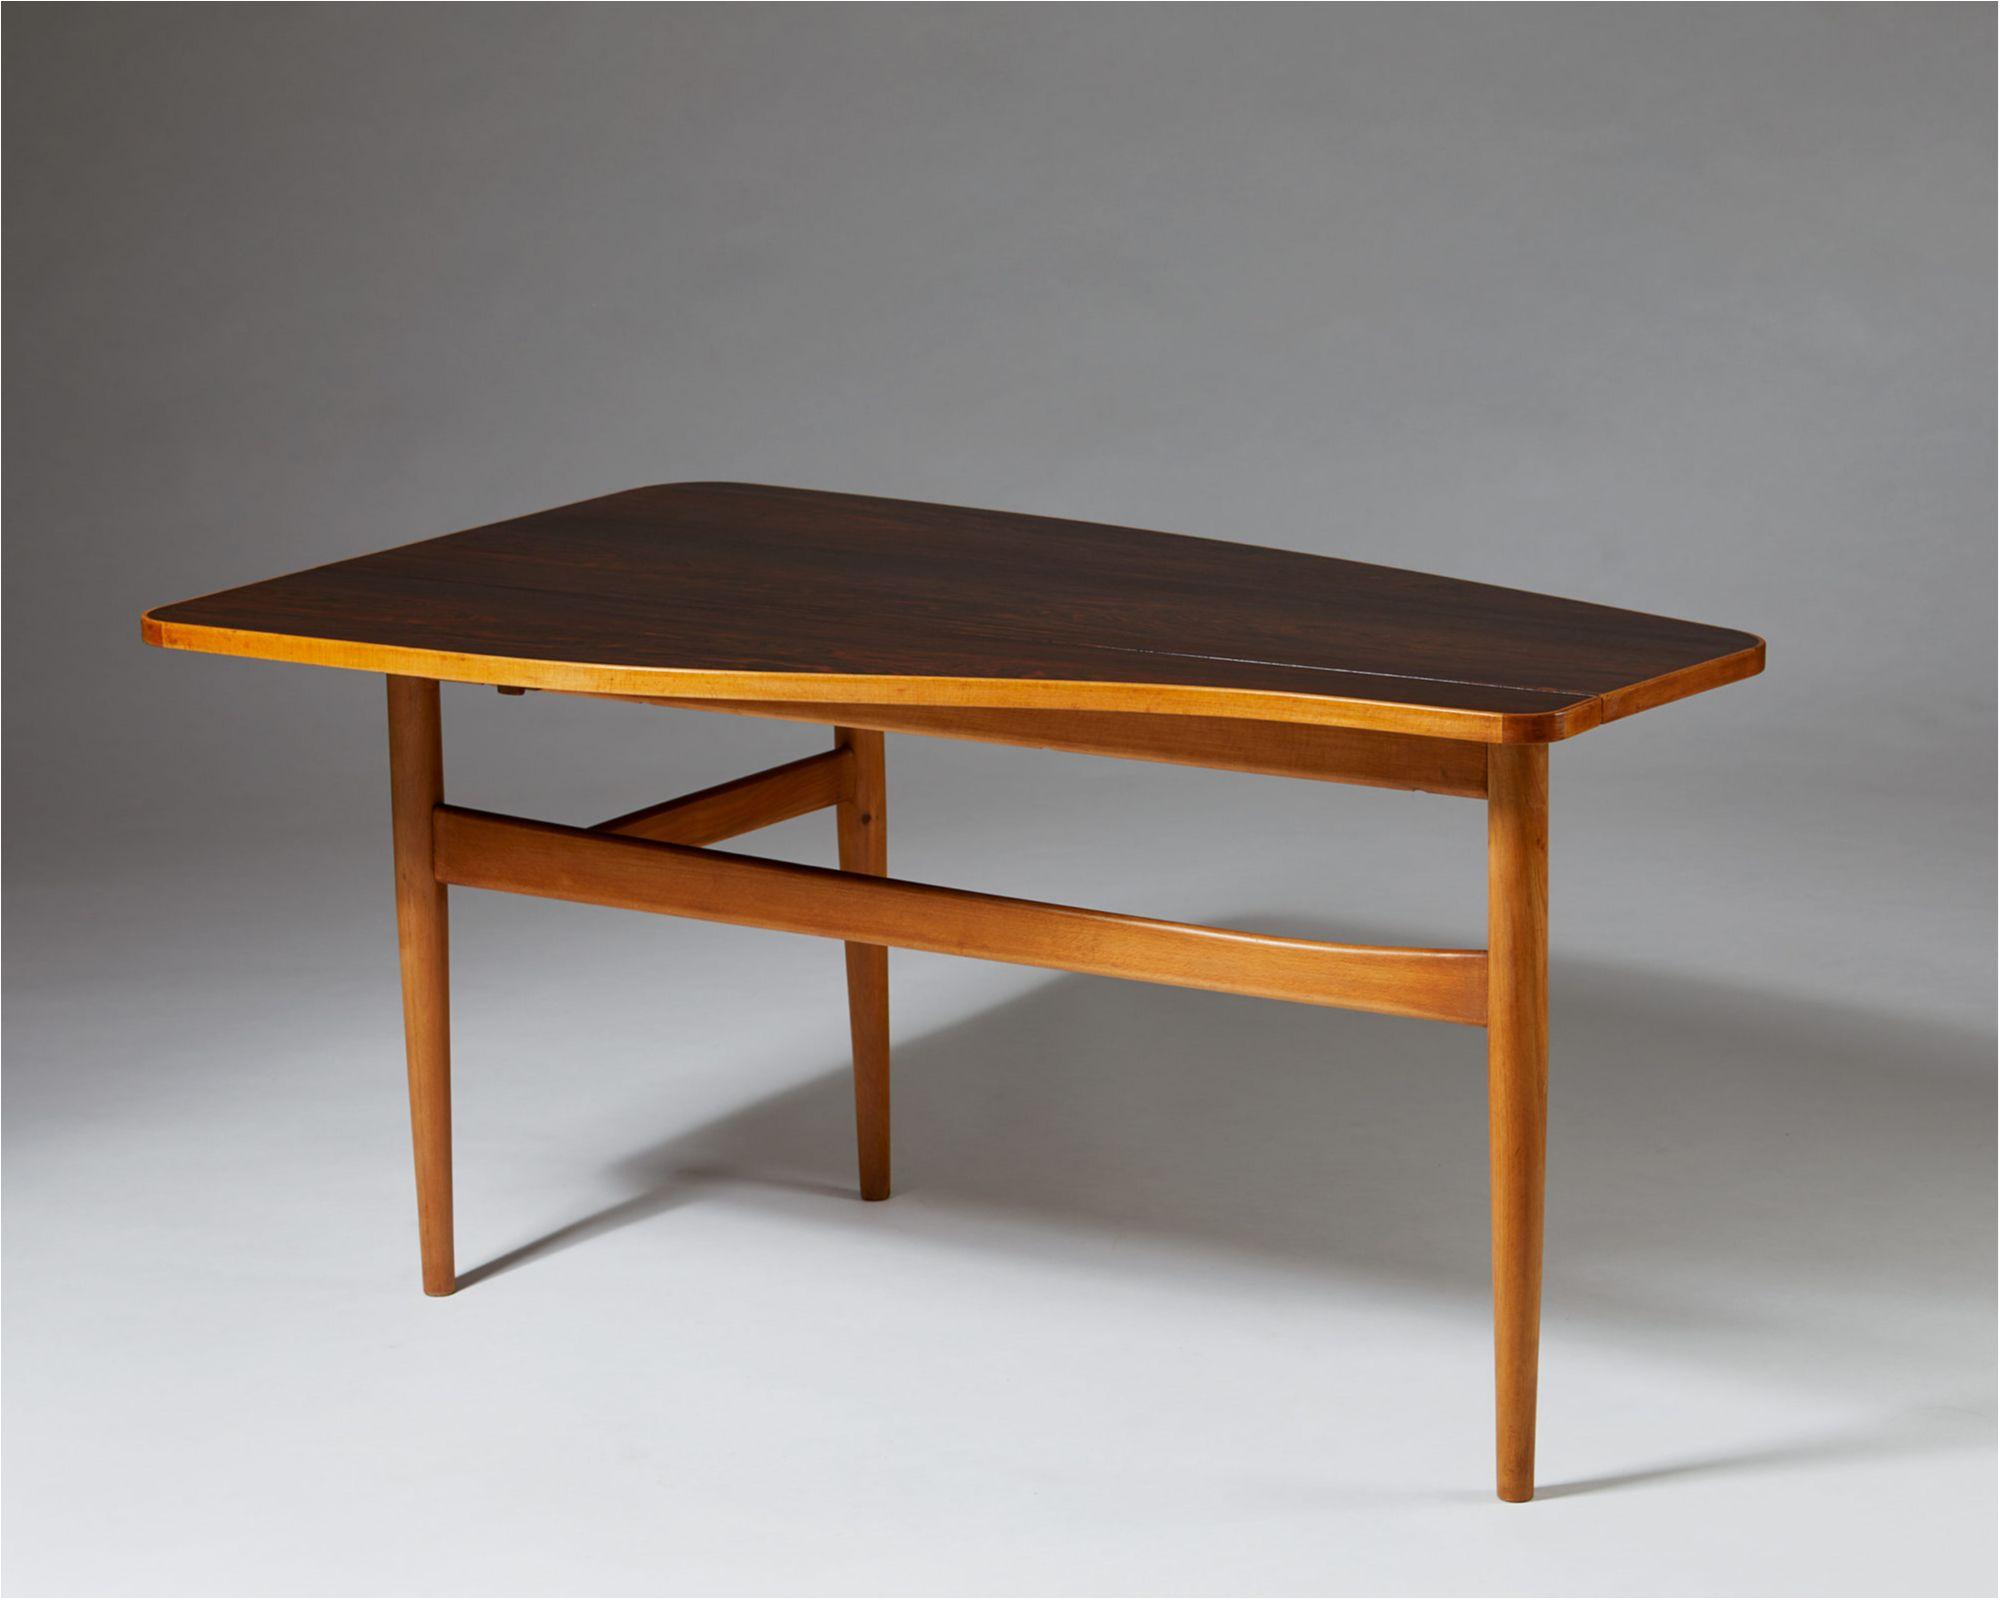 Sensational Occasional Table Designed By Finn Juhl For Bovirke Pabps2019 Chair Design Images Pabps2019Com